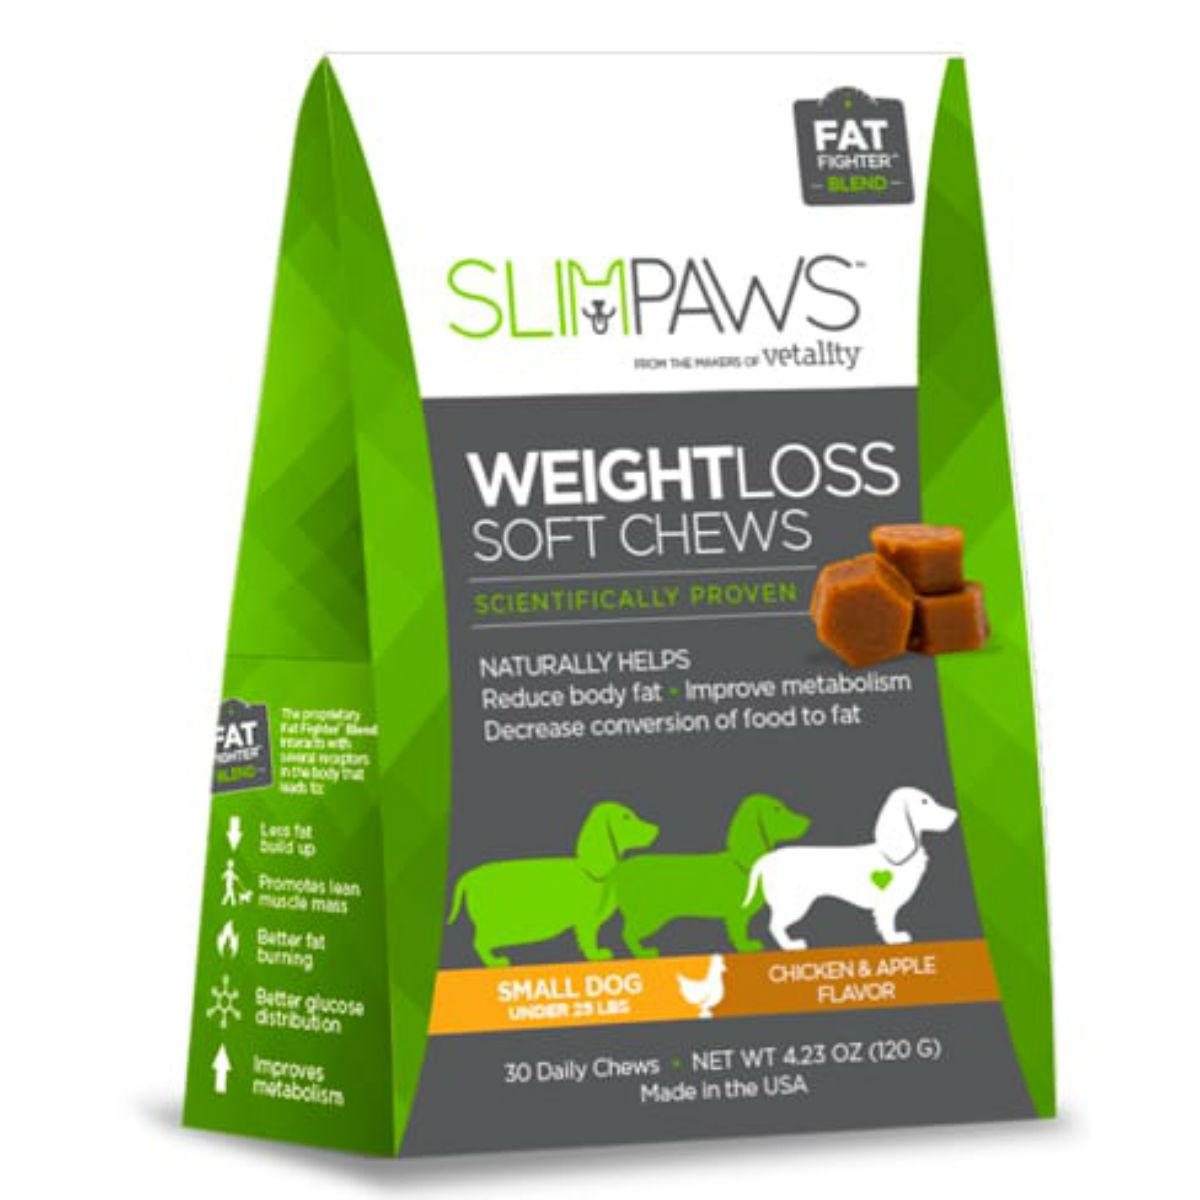 Vetality Slim Paws Weight Loss Soft Chews